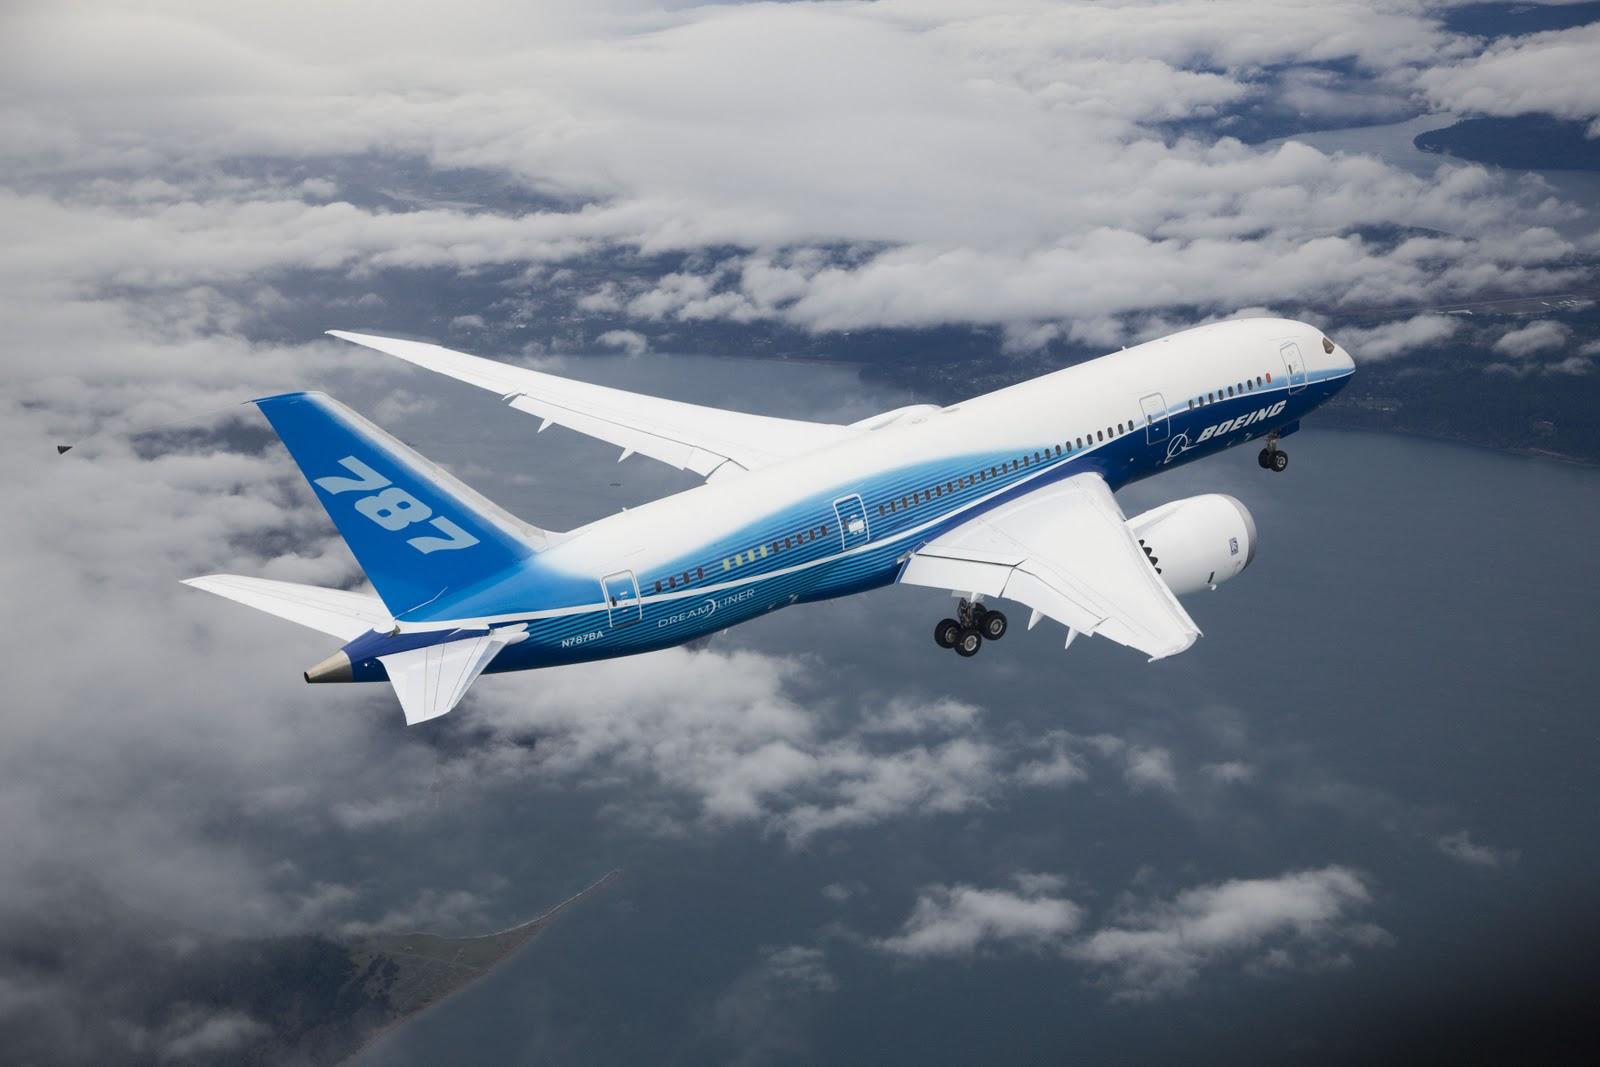 http://4.bp.blogspot.com/-q5C5rGfKV1w/TxLRVKcAYmI/AAAAAAAAHXY/y4nCoyd8Hvc/s1600/boeing_787_dreamliner_over_clouds.jpg